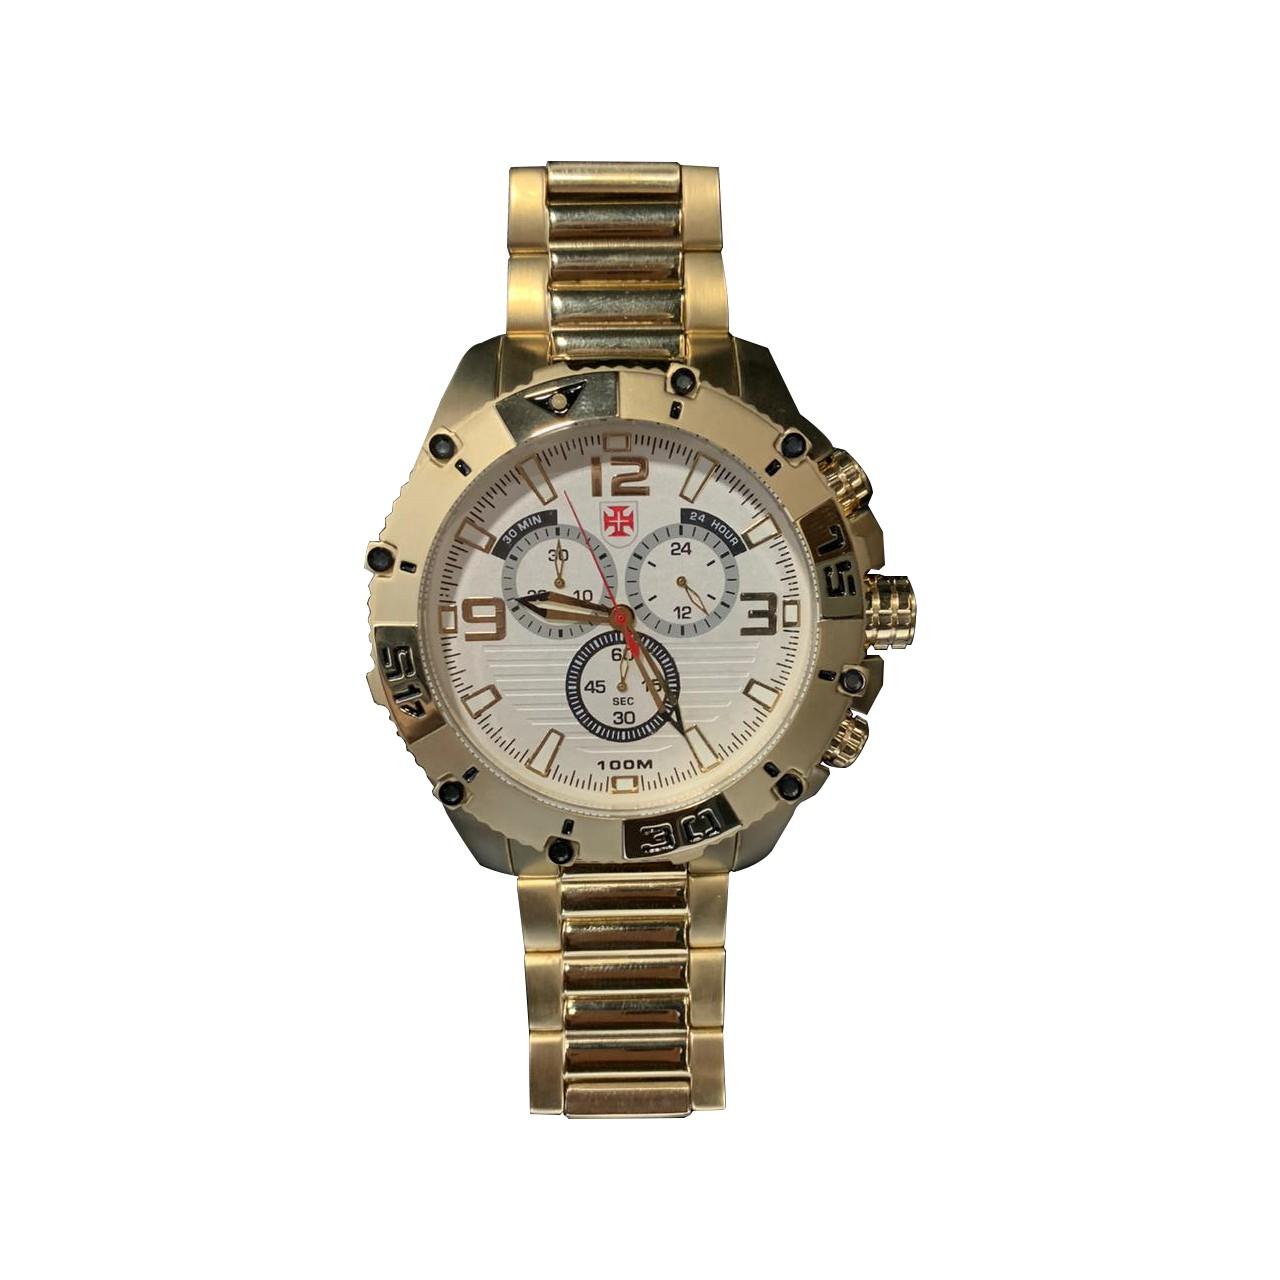 Relógio Vasco - Dourado